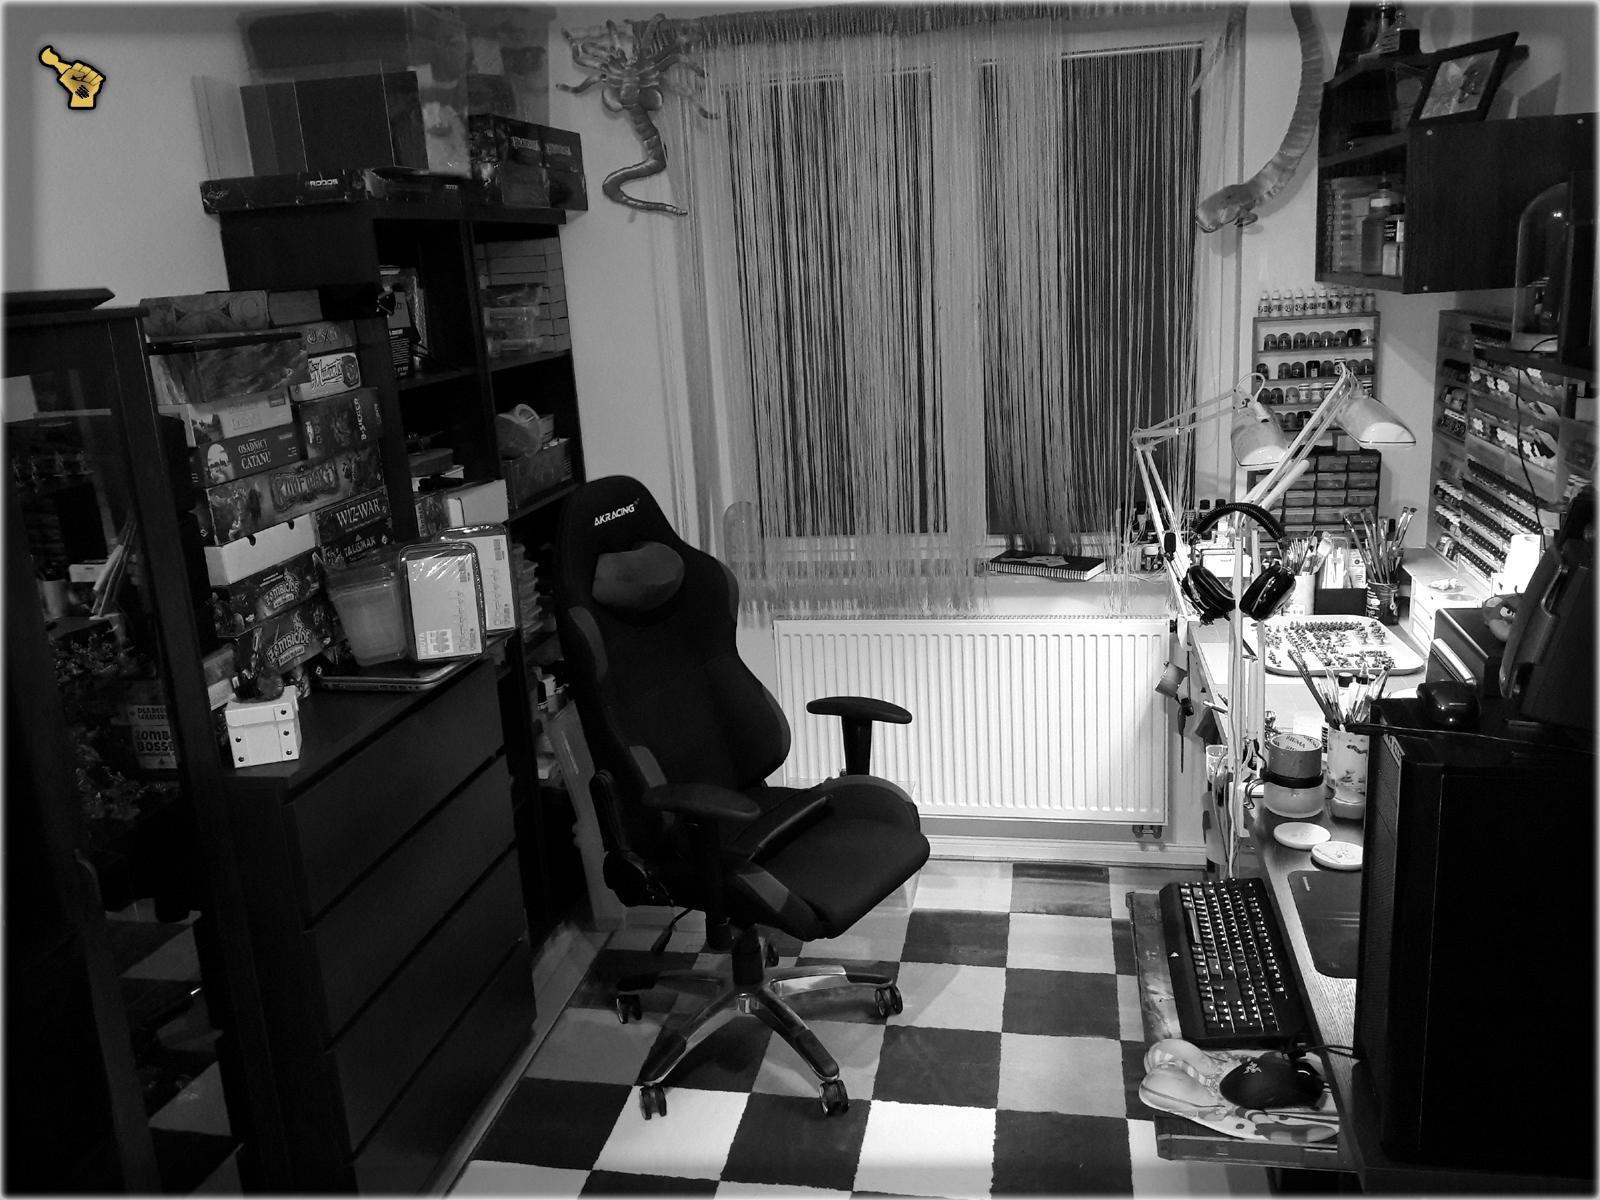 scarhandpainting-workbench-katowice-1